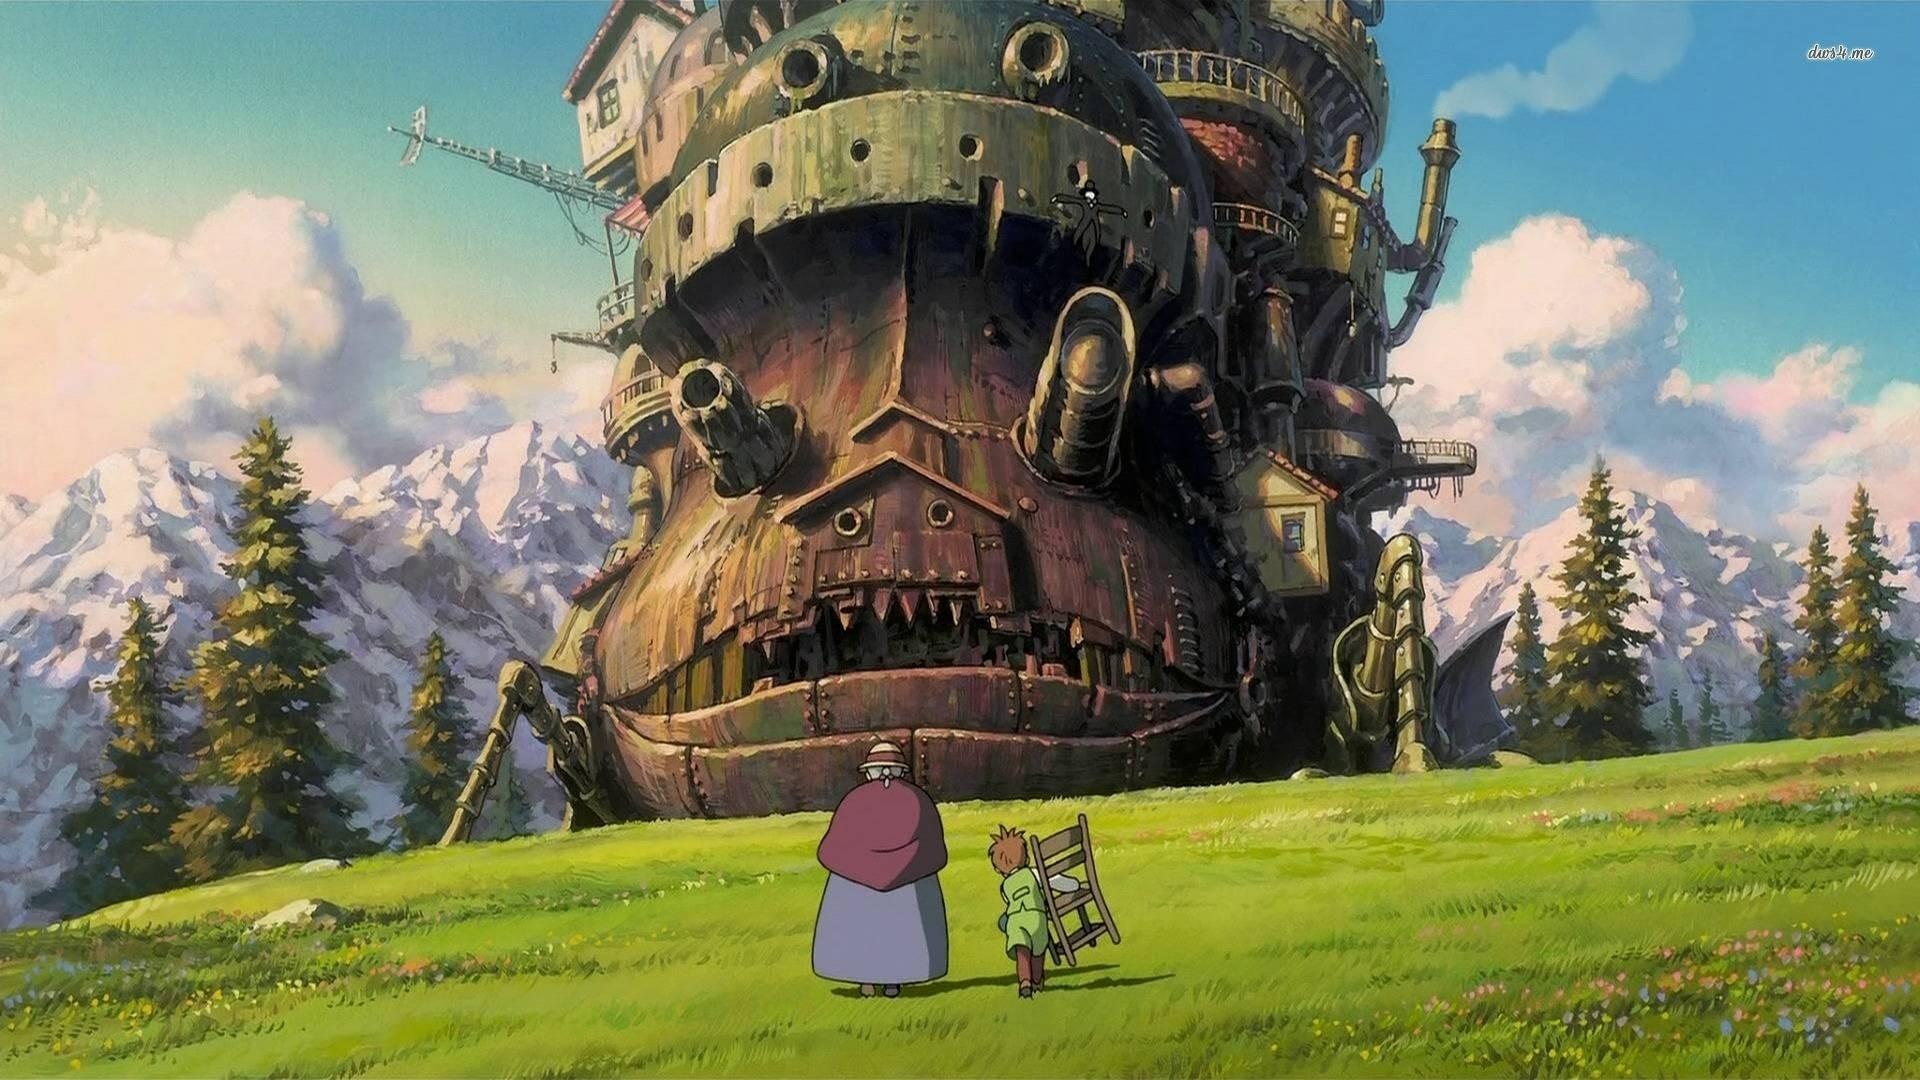 Ghibli wallpaper